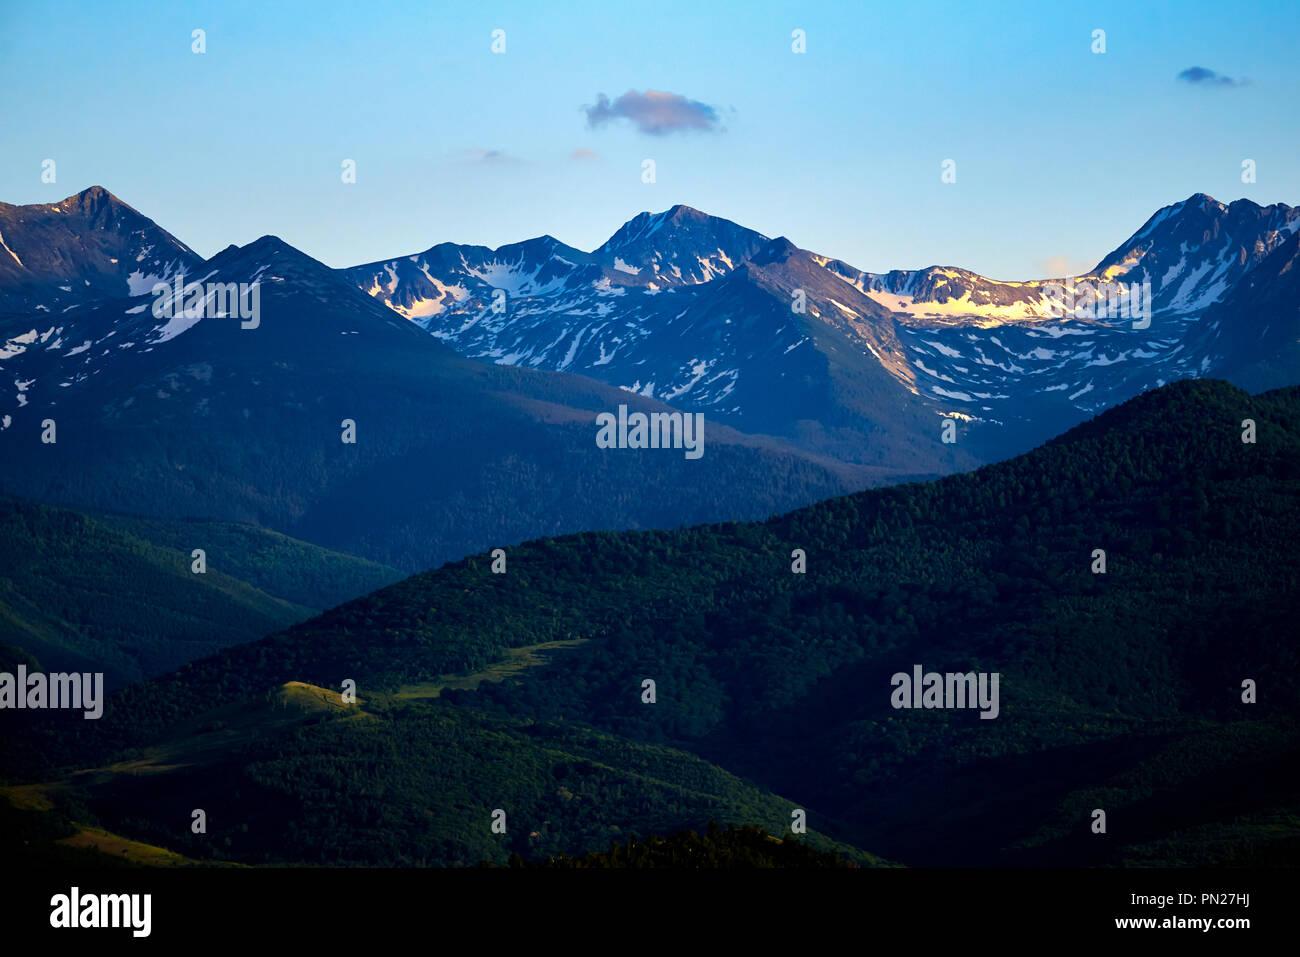 Beautiful mountains landscape - Stock Image